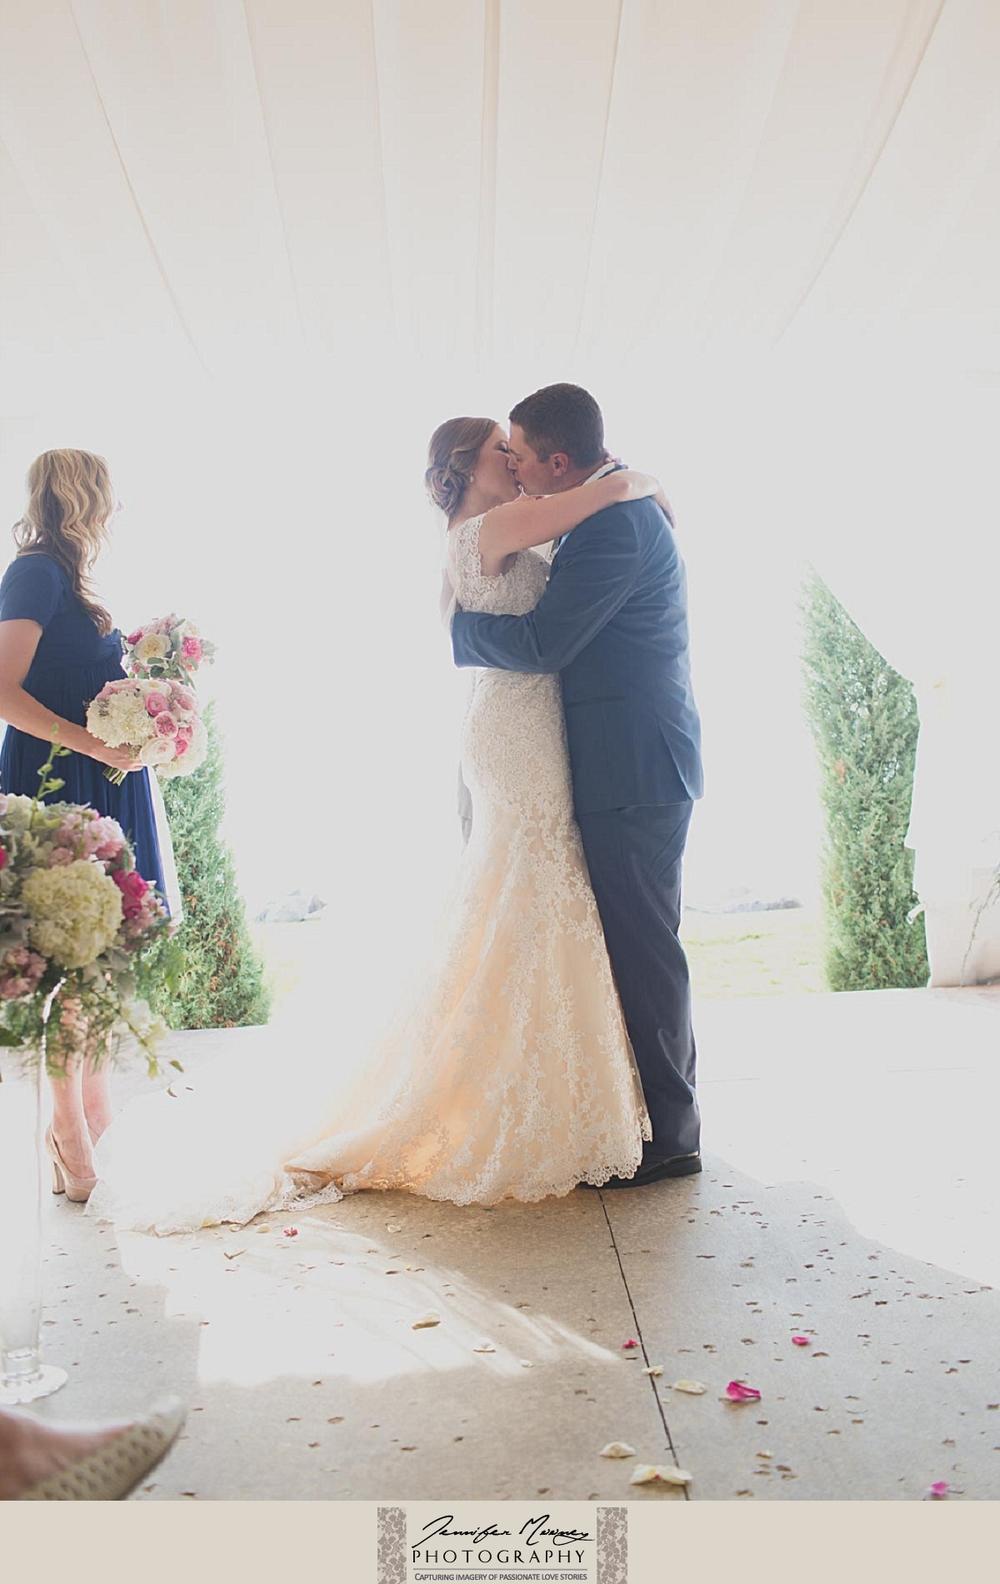 Jennifer_Mooney_Photo_ostler_Czahoroski_wedding_whitefish_lake_lodge_soulmates_love_montana_wedding_00166.jpg